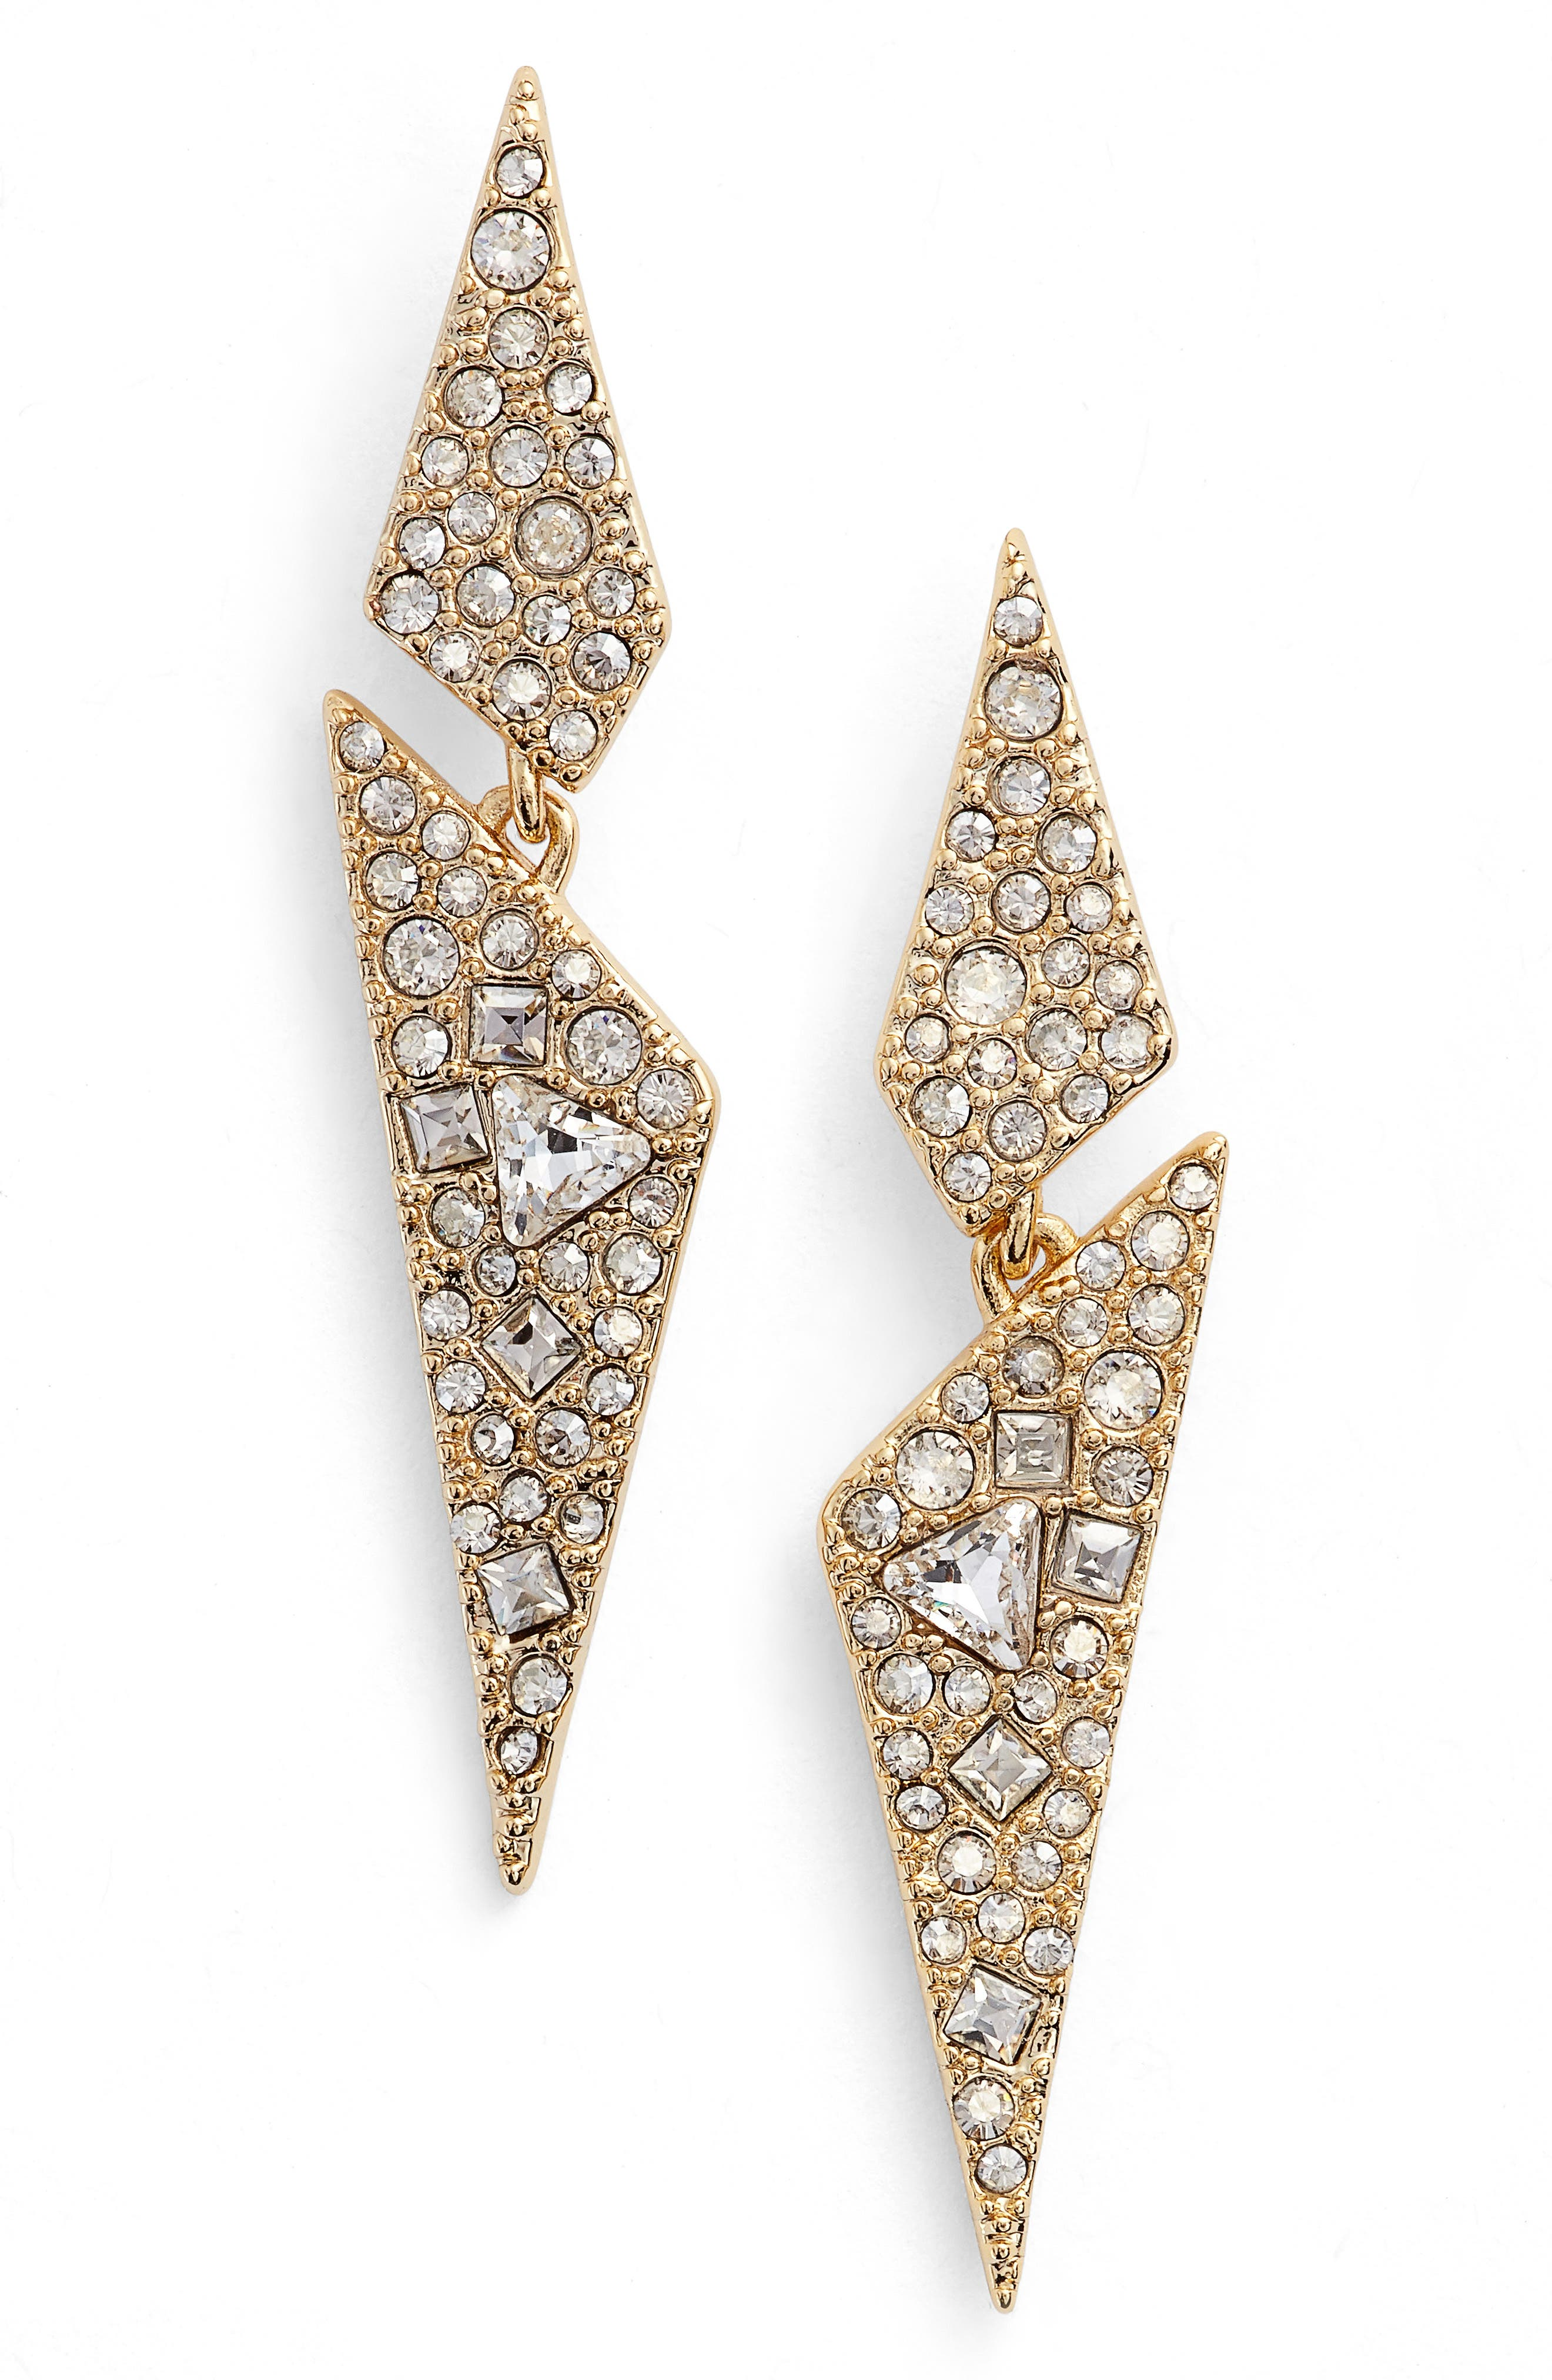 Crystal Encrusted Dangling Drop Earrings,                             Main thumbnail 1, color,                             710